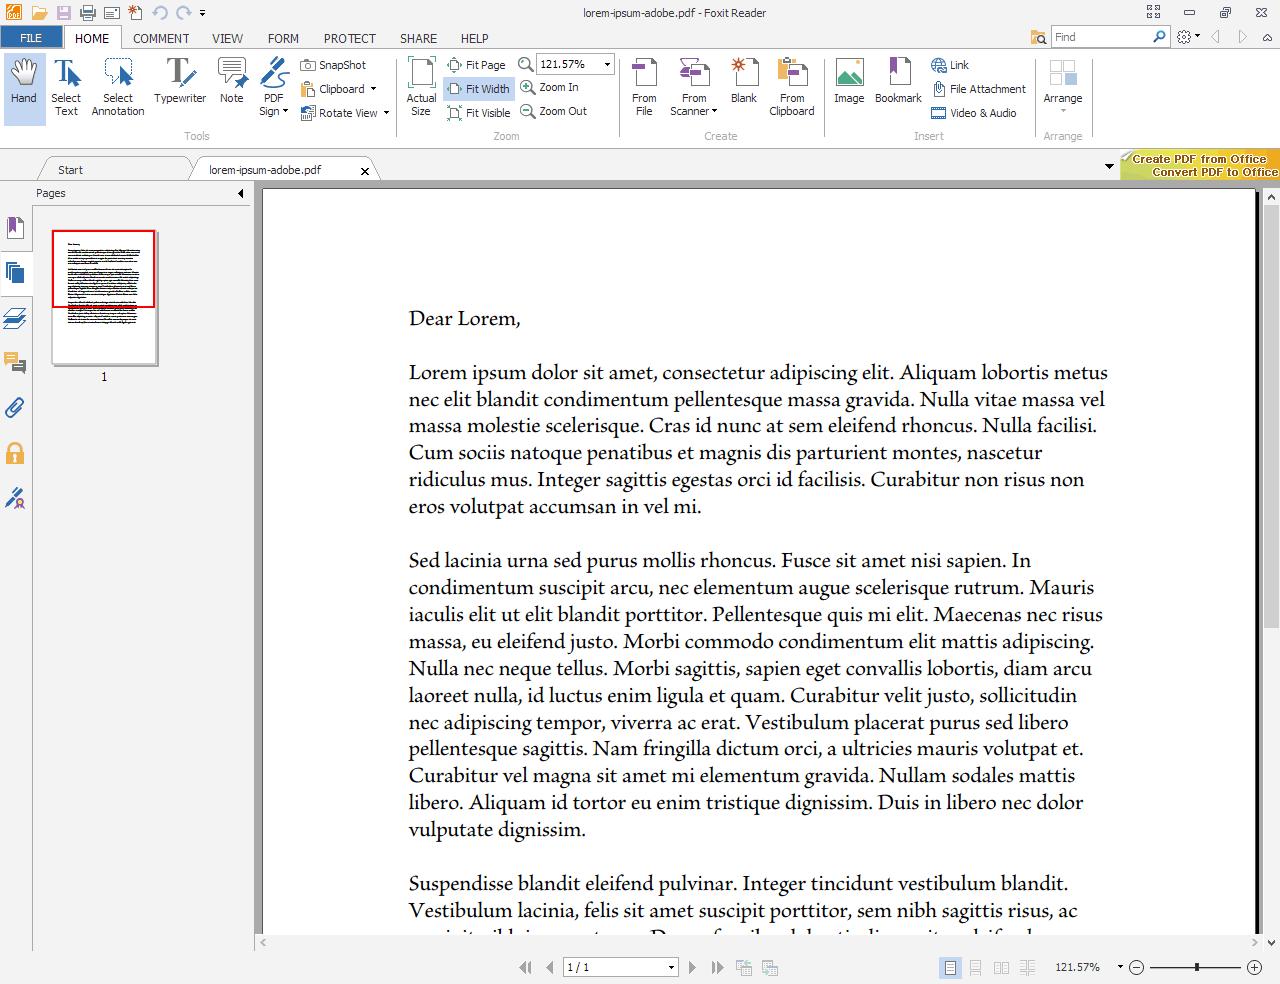 foxit pdf converter free download full version